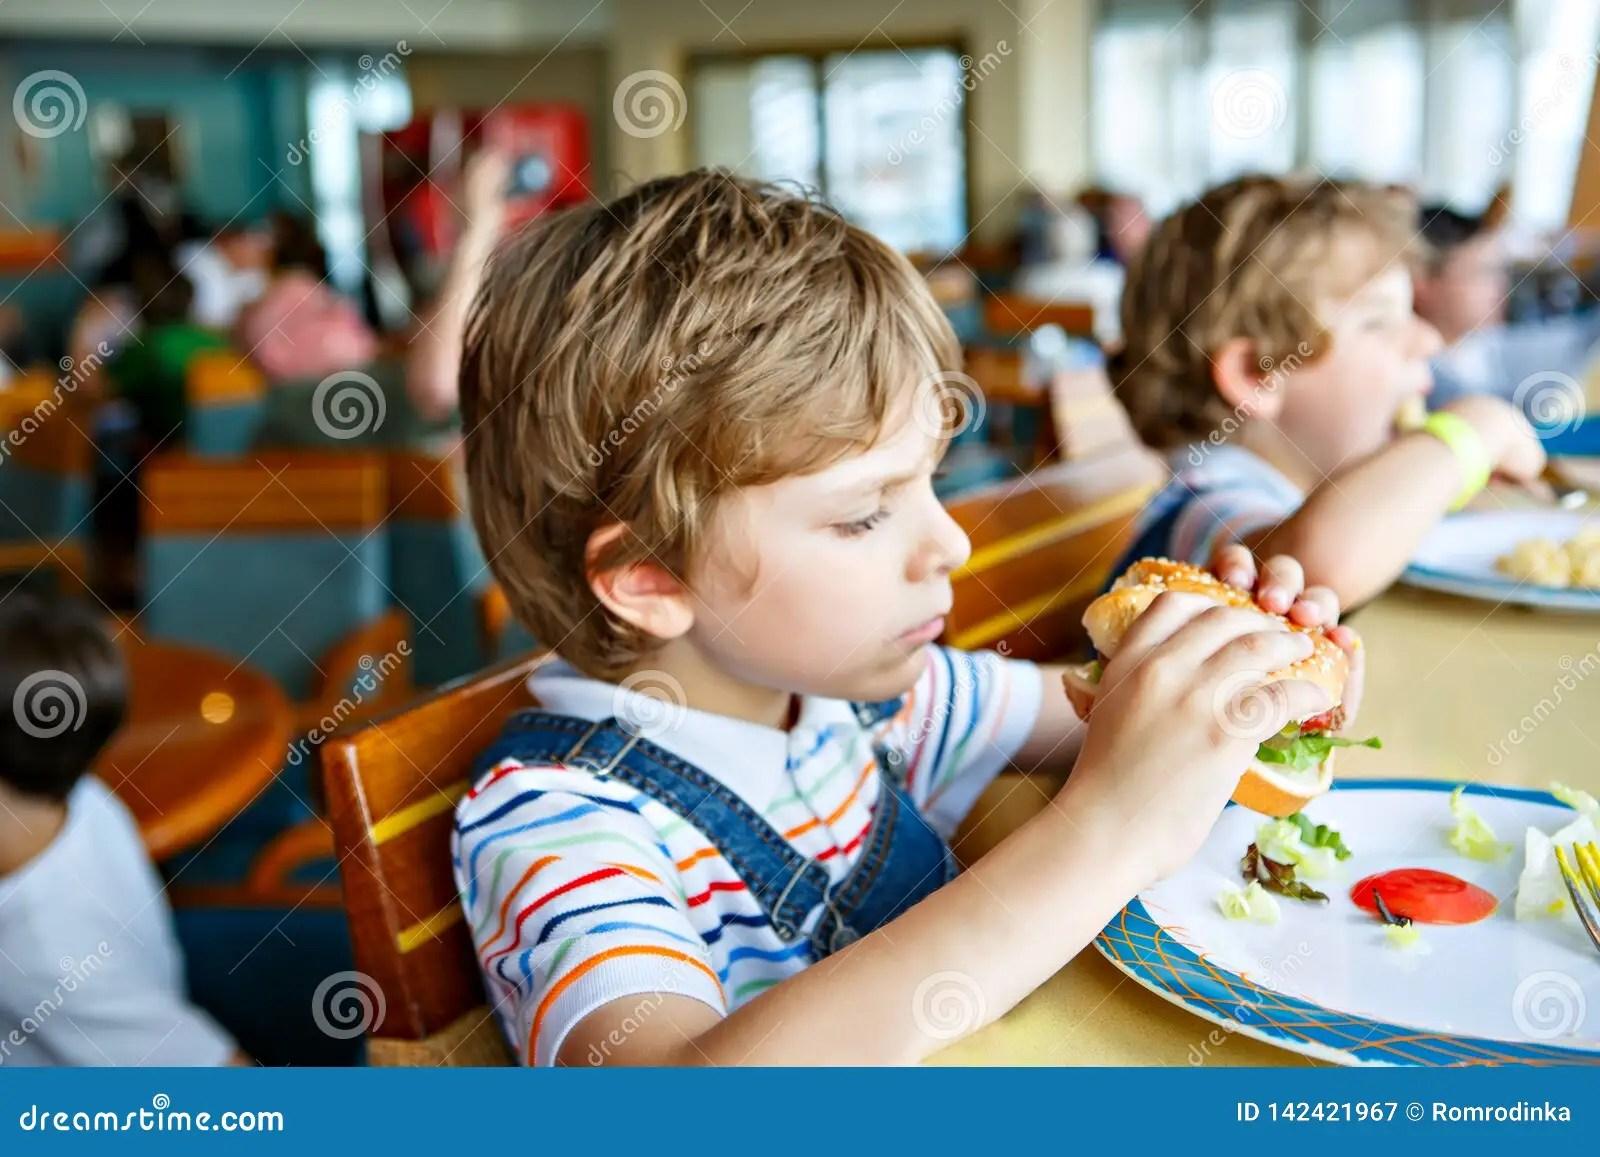 Cute Healthy Preschool Kid Boy Eats Hamburger Sitting In